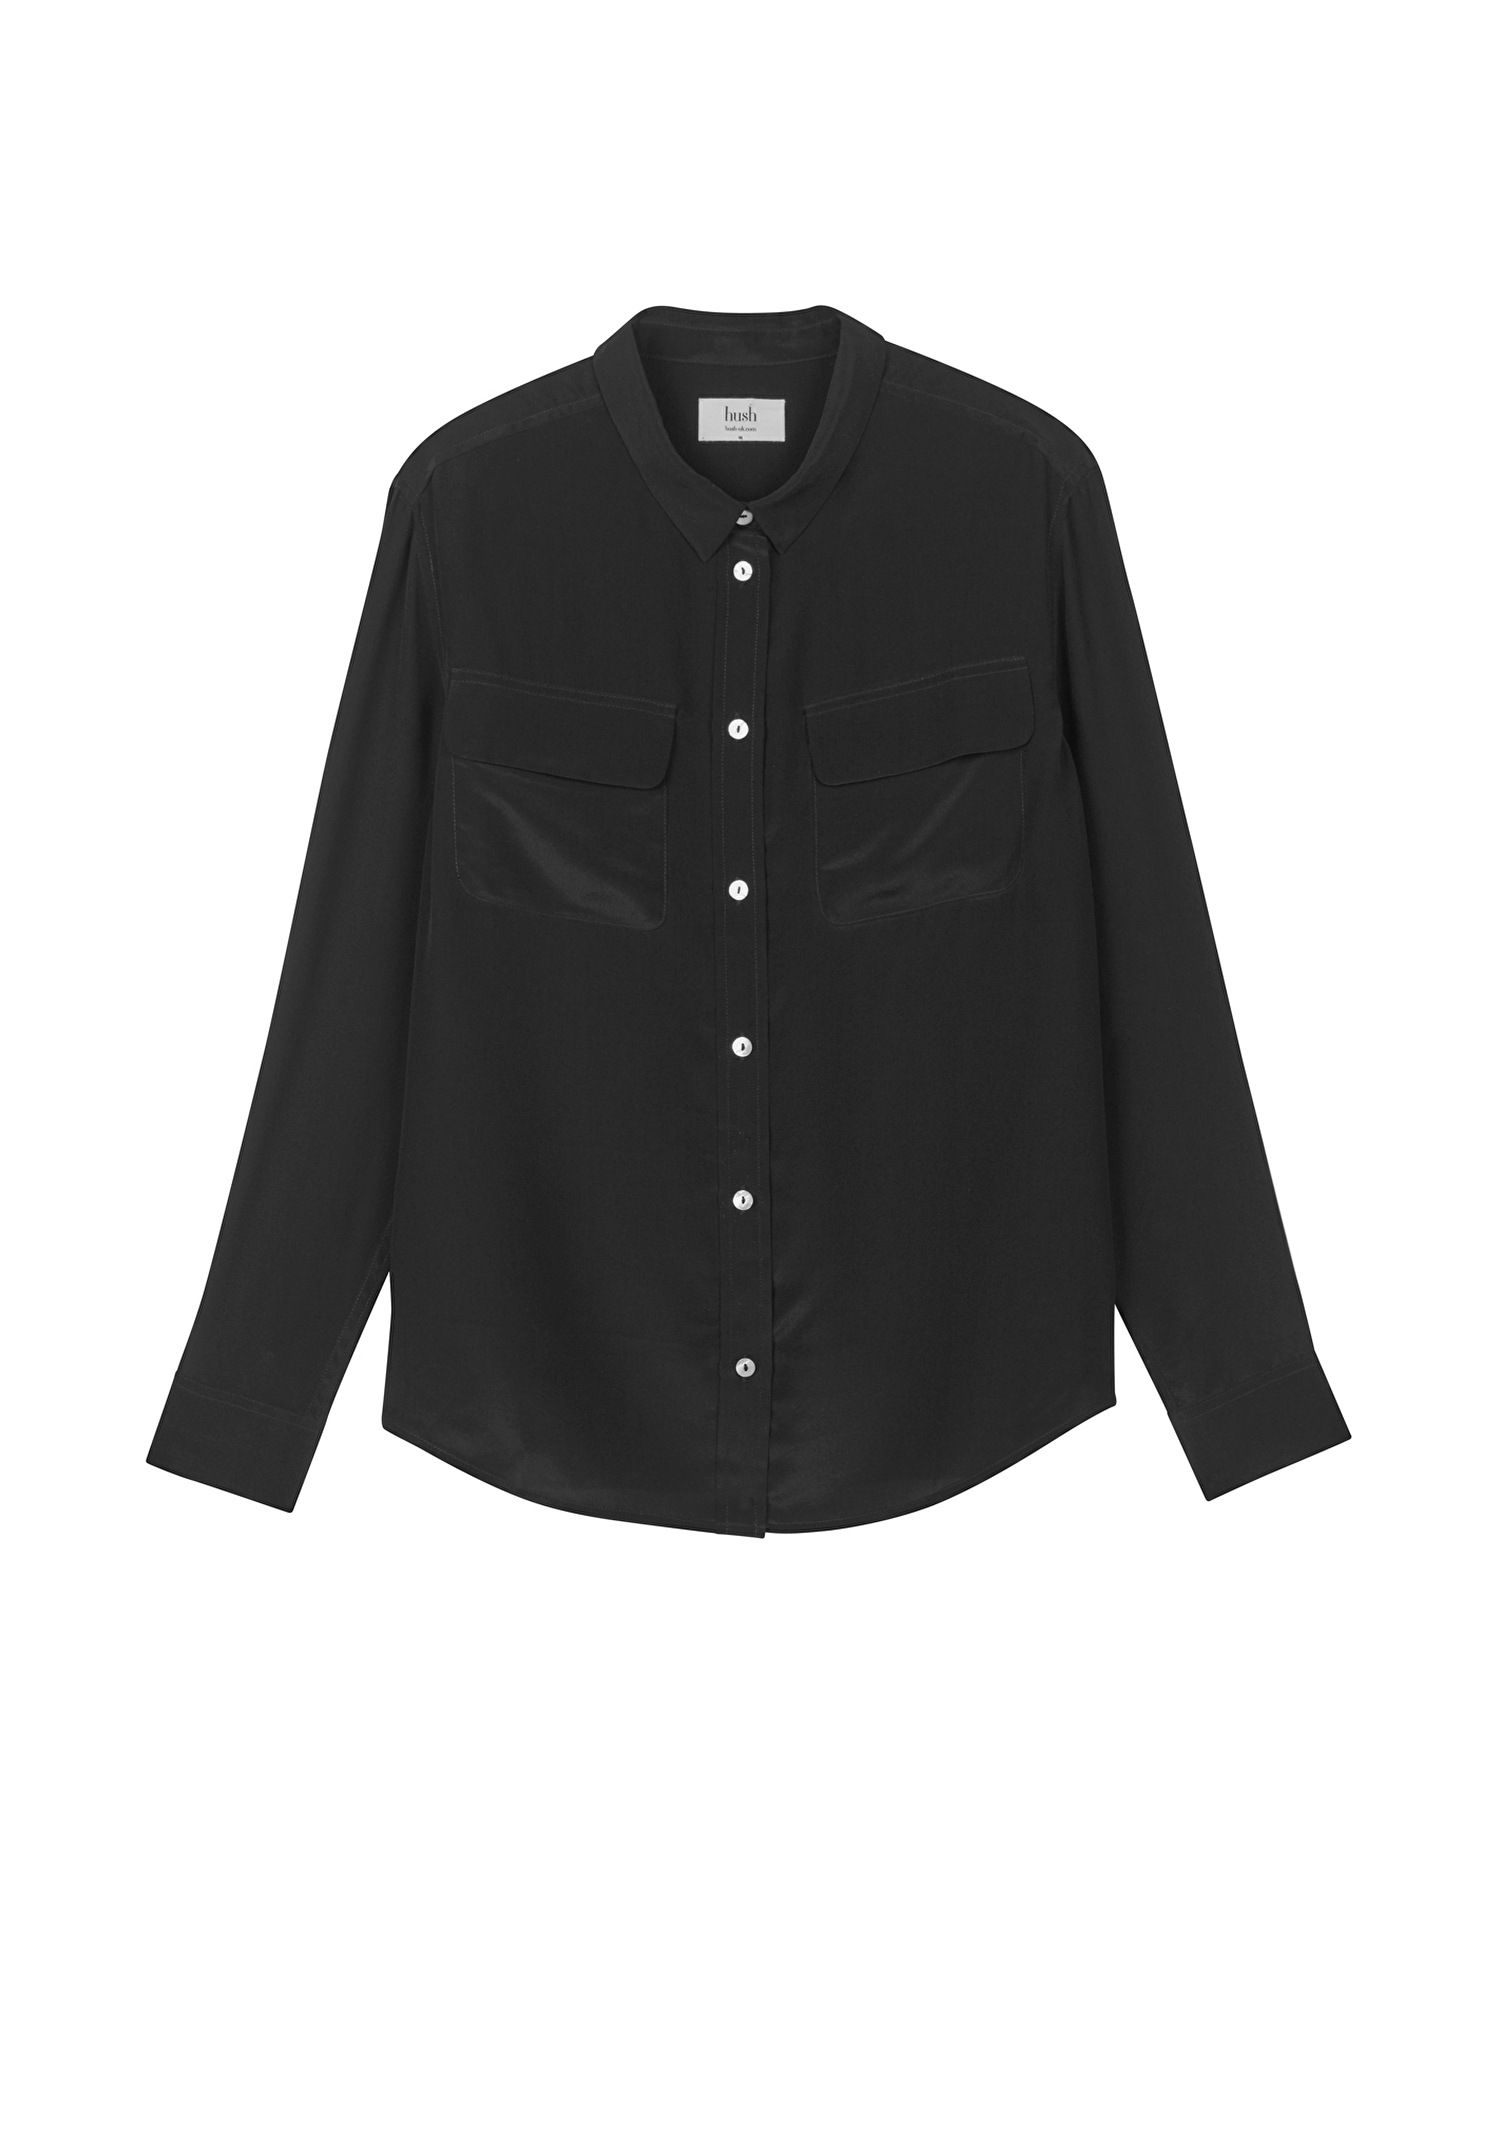 Cecilia Silk Shirt Clothe Black Paraphrase Jacket Tk Maxx